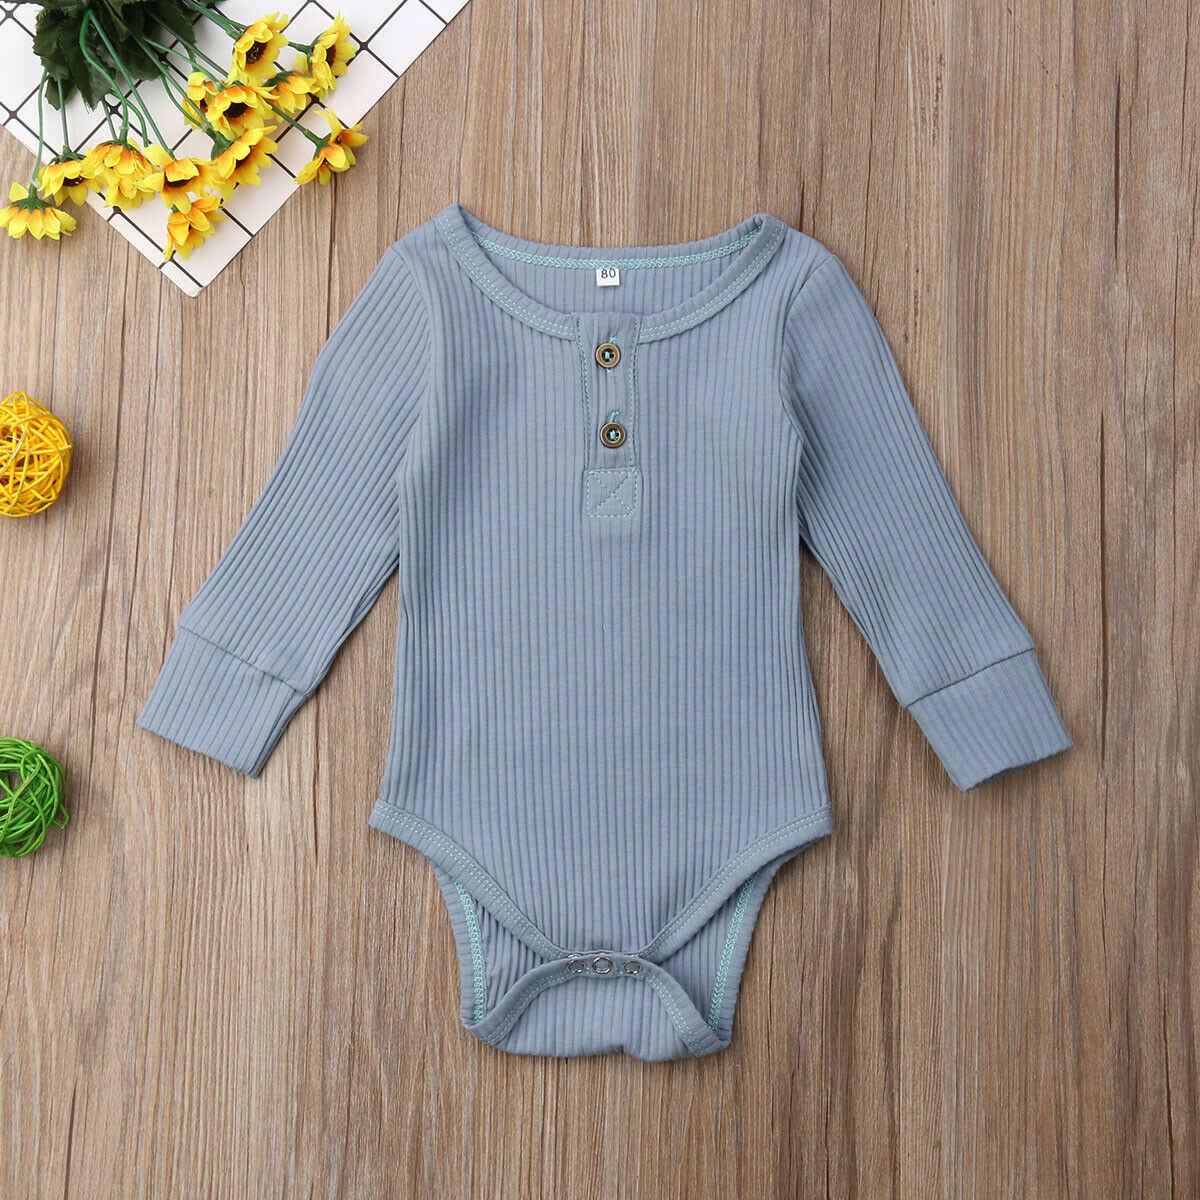 2020 Brand Nieuwe Pasgeboren Baby Baby Meisje Jongen Geribbelde Bodysuit Ruffle One-Stukken Solid Jumpsuit Lange Mouwen Outfits Lente sunsuit